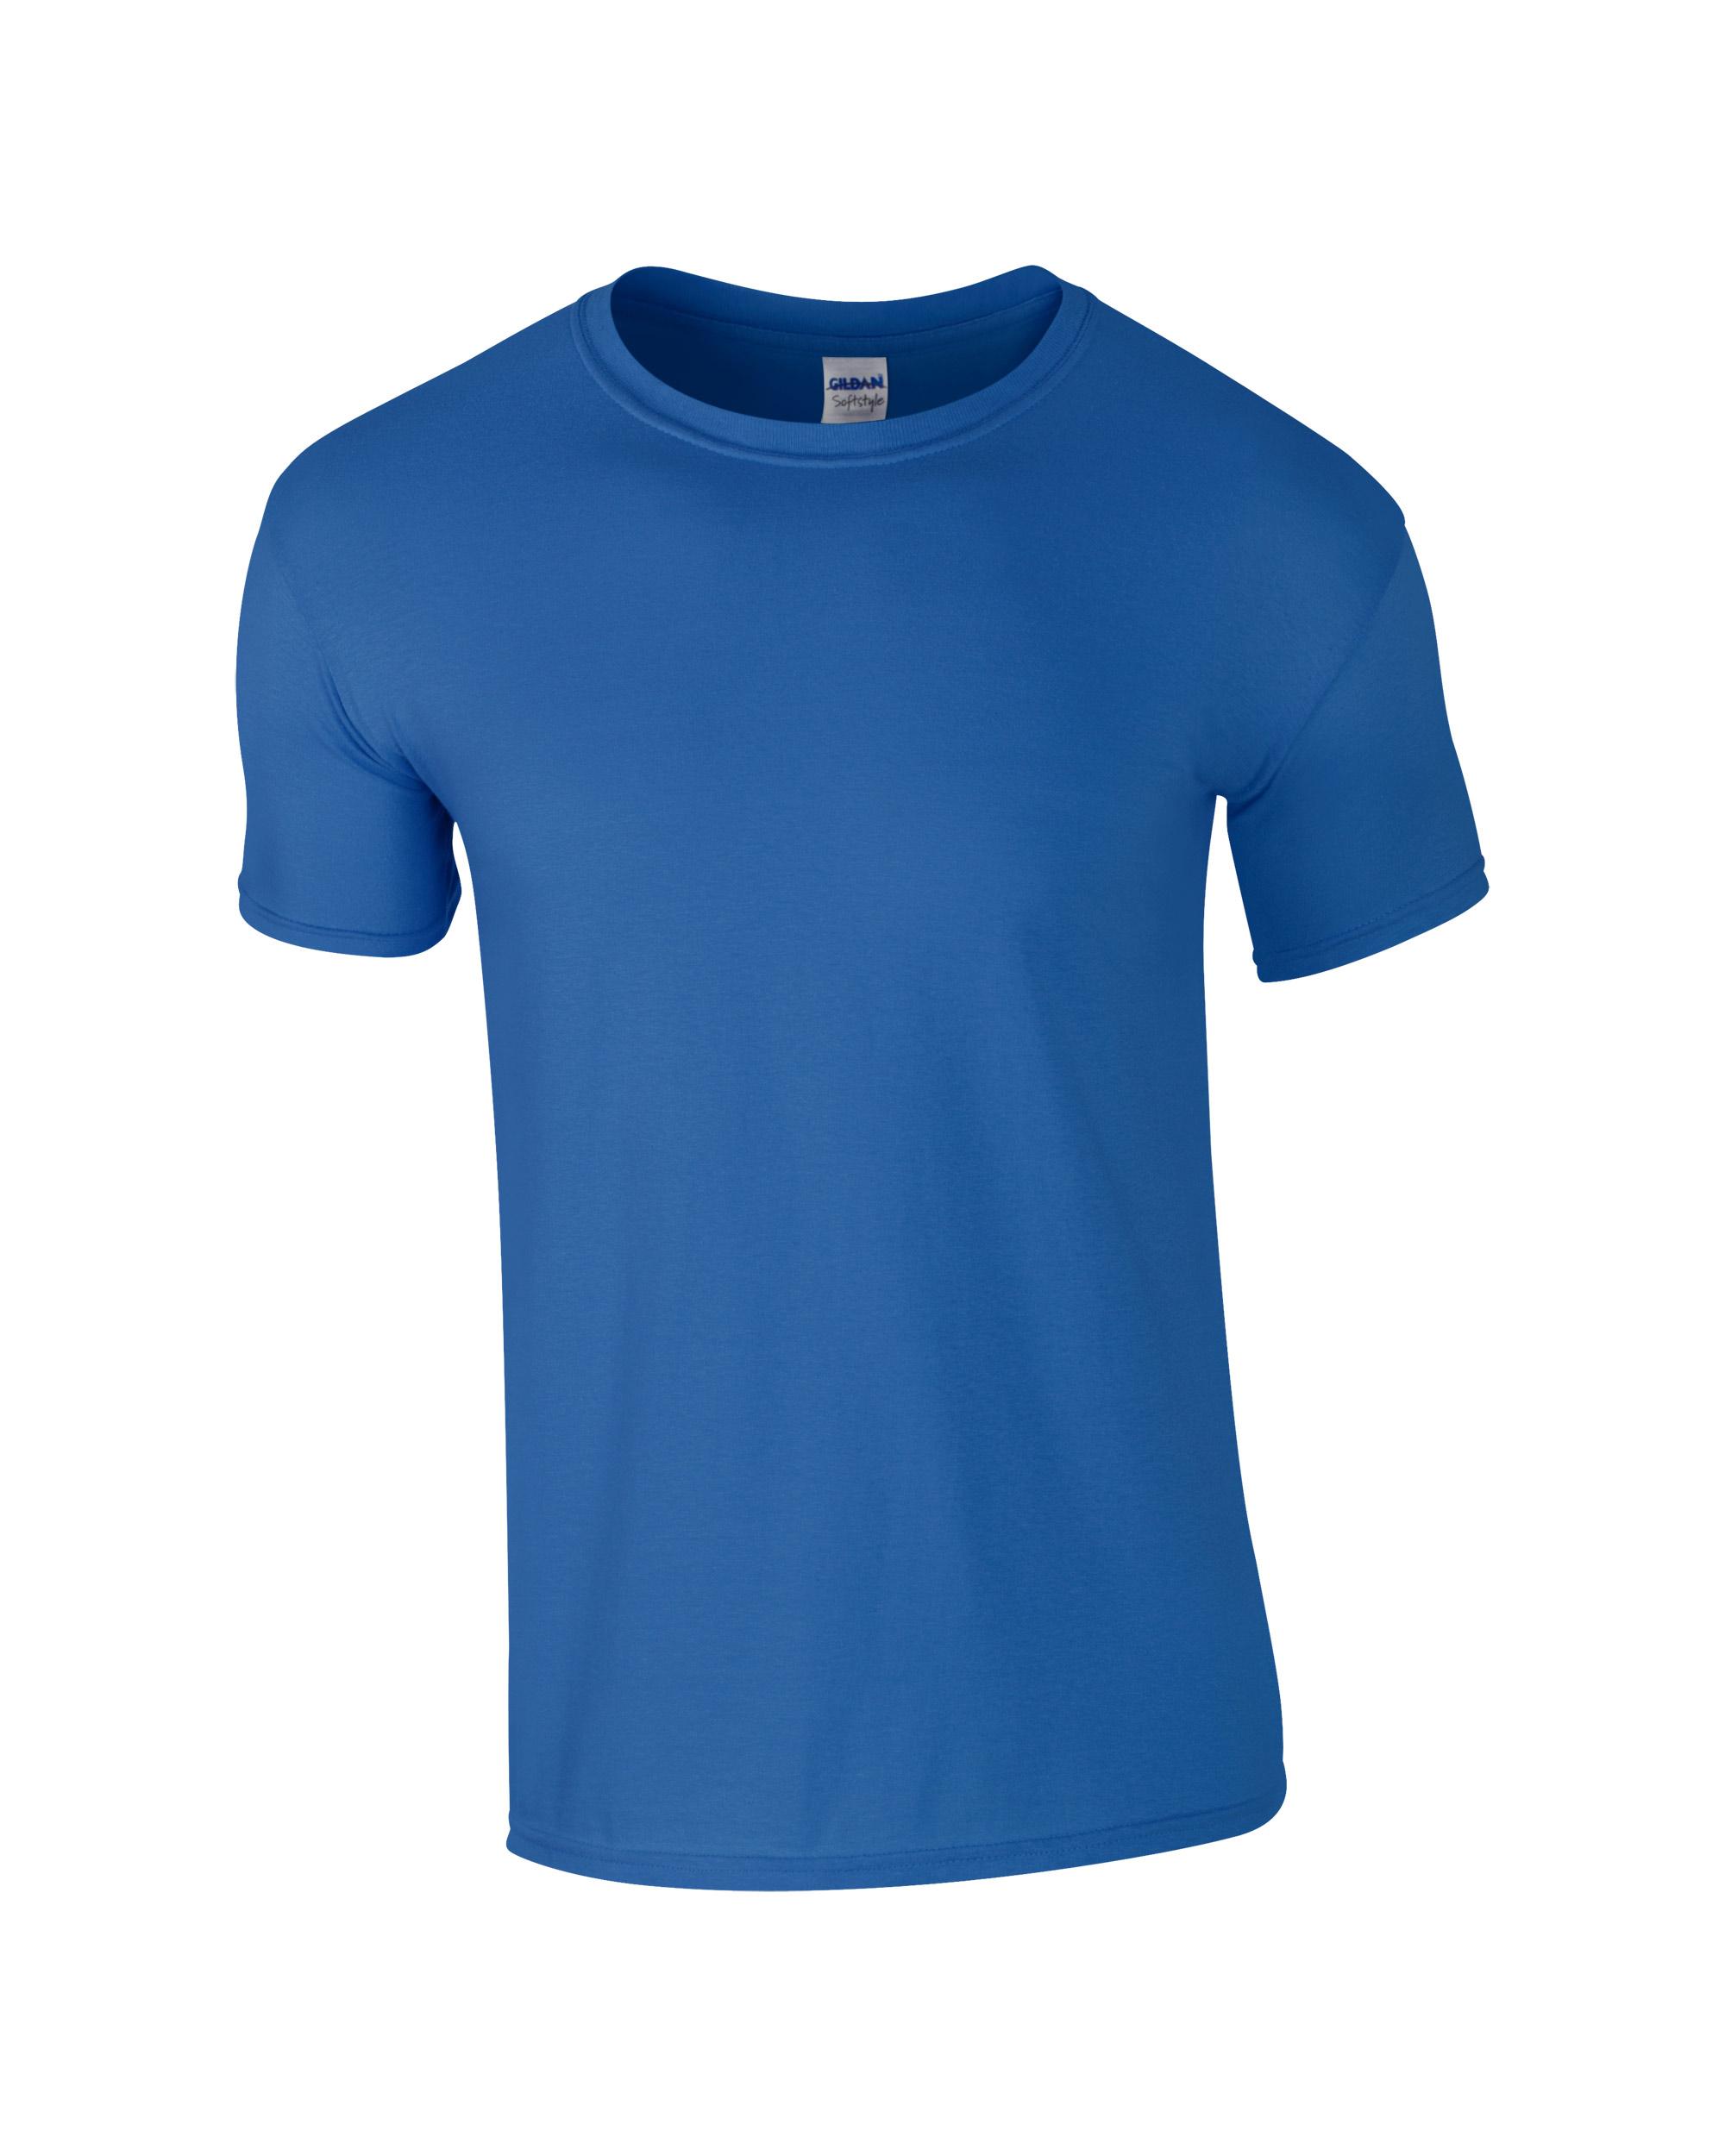 Muška T-shirt majica kratki rukav royal plava